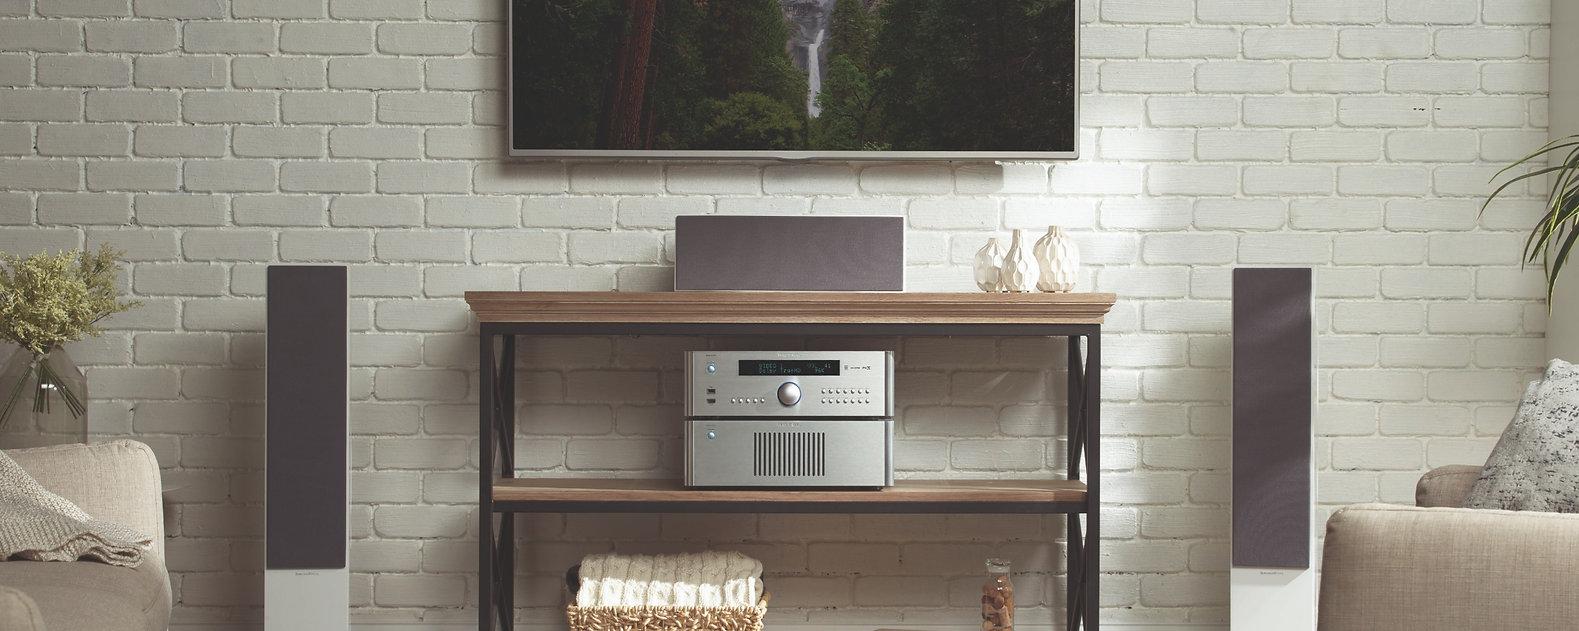 Rotel RAP1580 Mk2 Atmos home theatre amplifier,